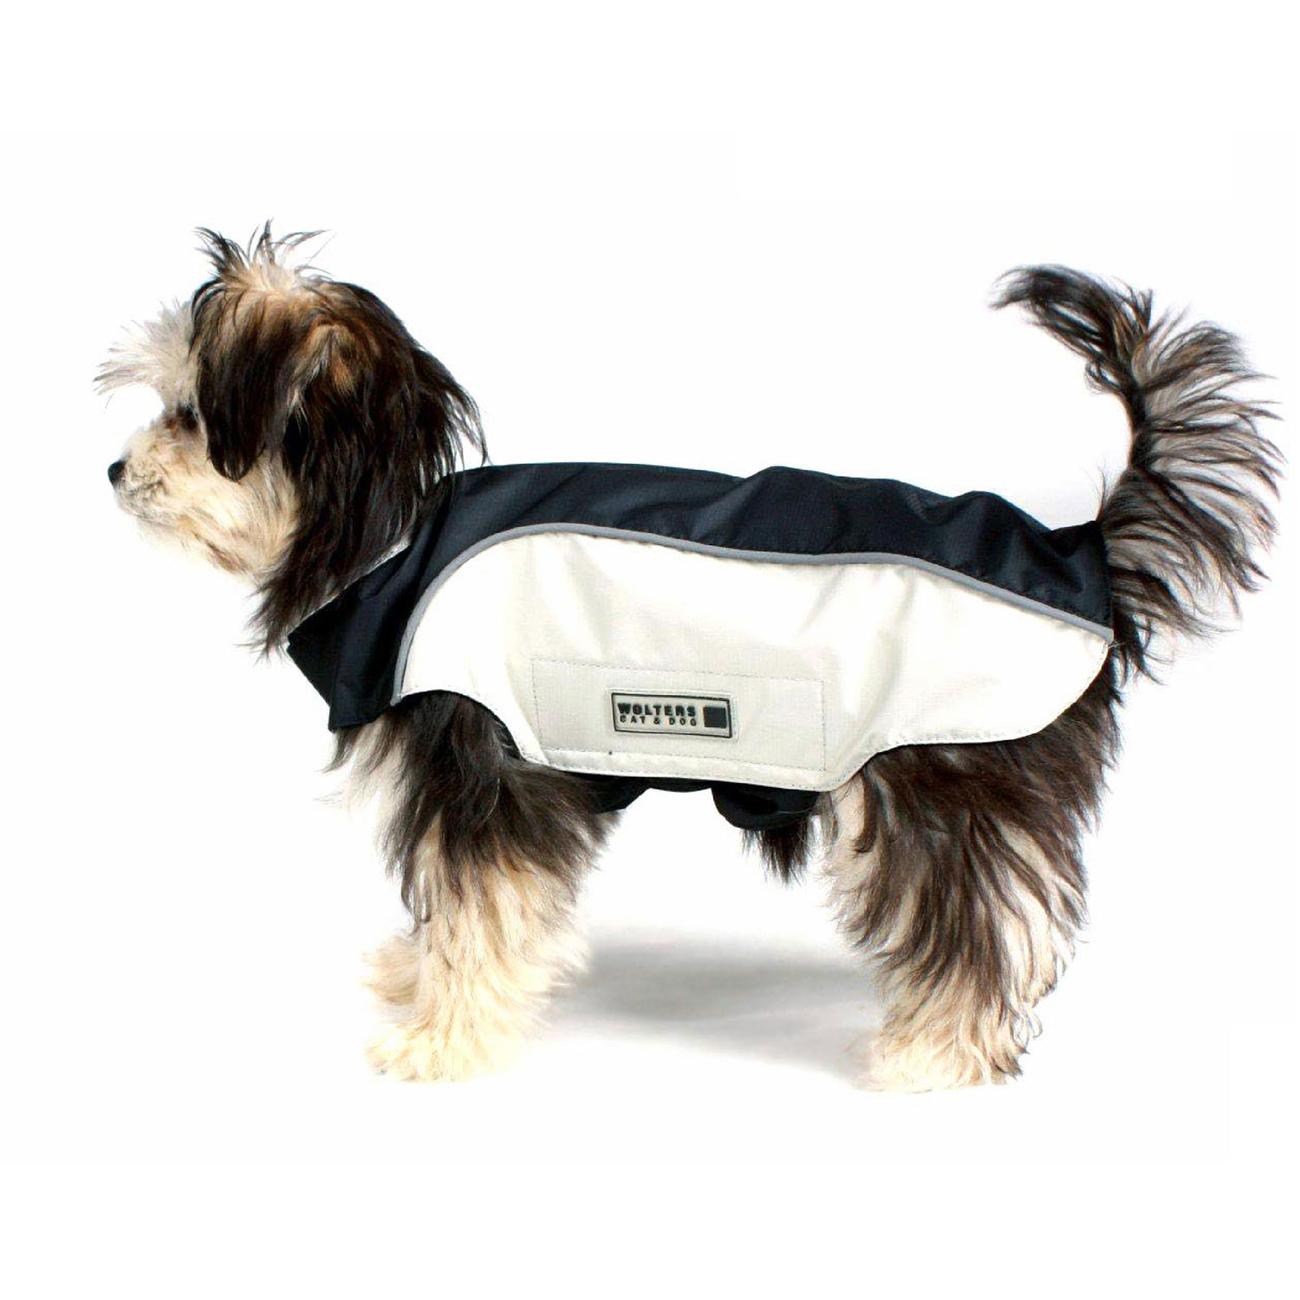 Wolters Regenjacke für Hunde Easy Rain, Bild 14